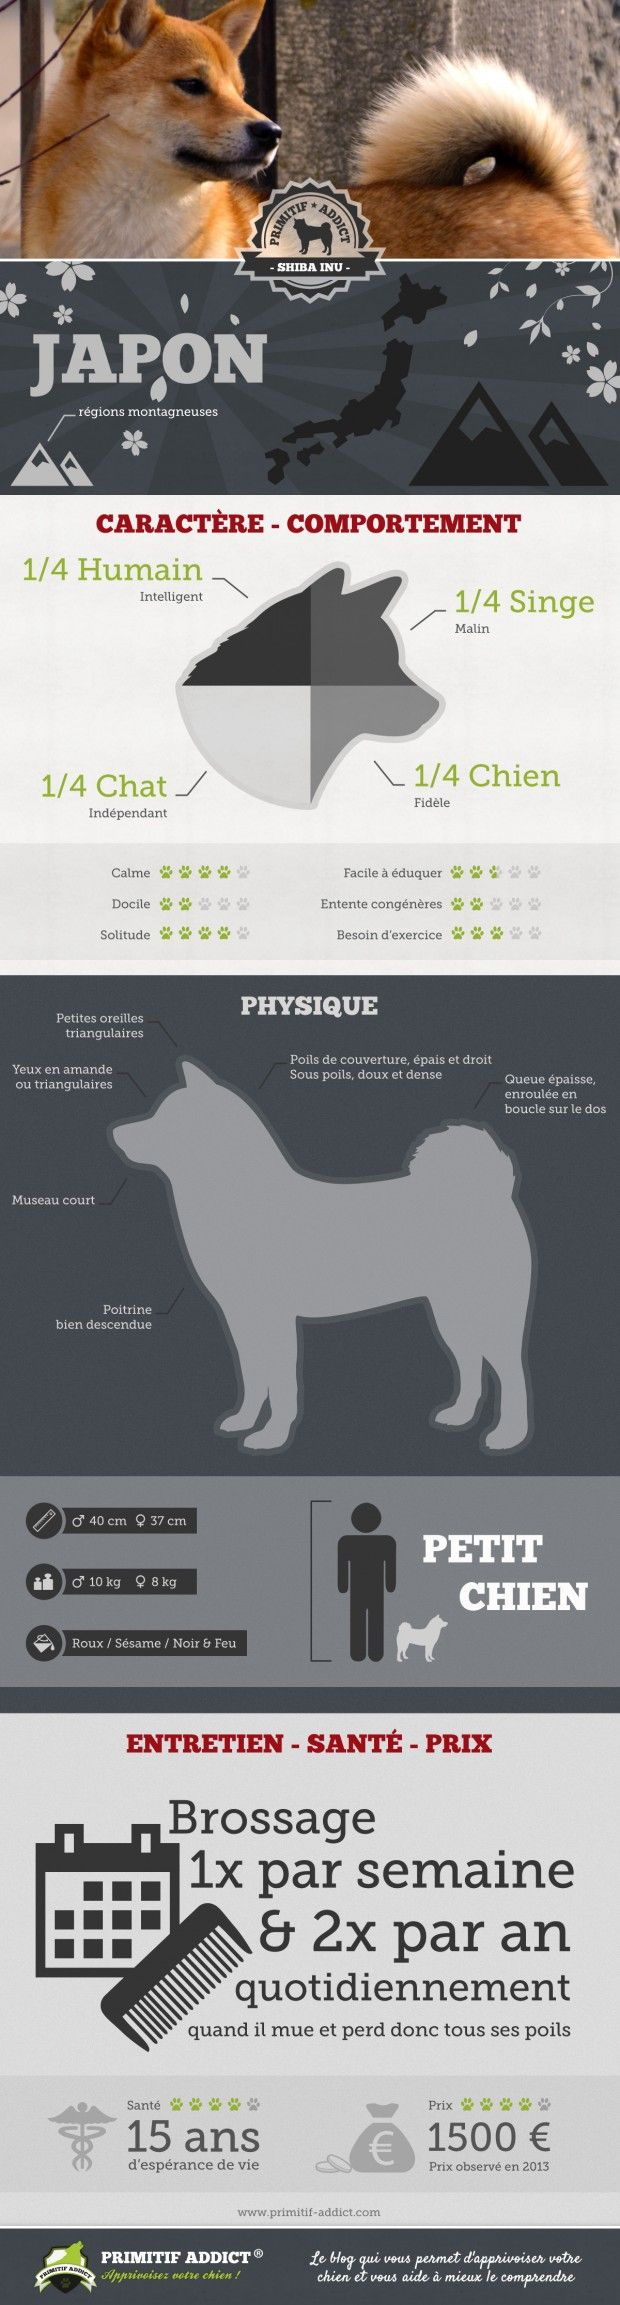 Primitif Addict | Zoom sur le Shiba Inu #shibainu #shiba #dog #pet #inu